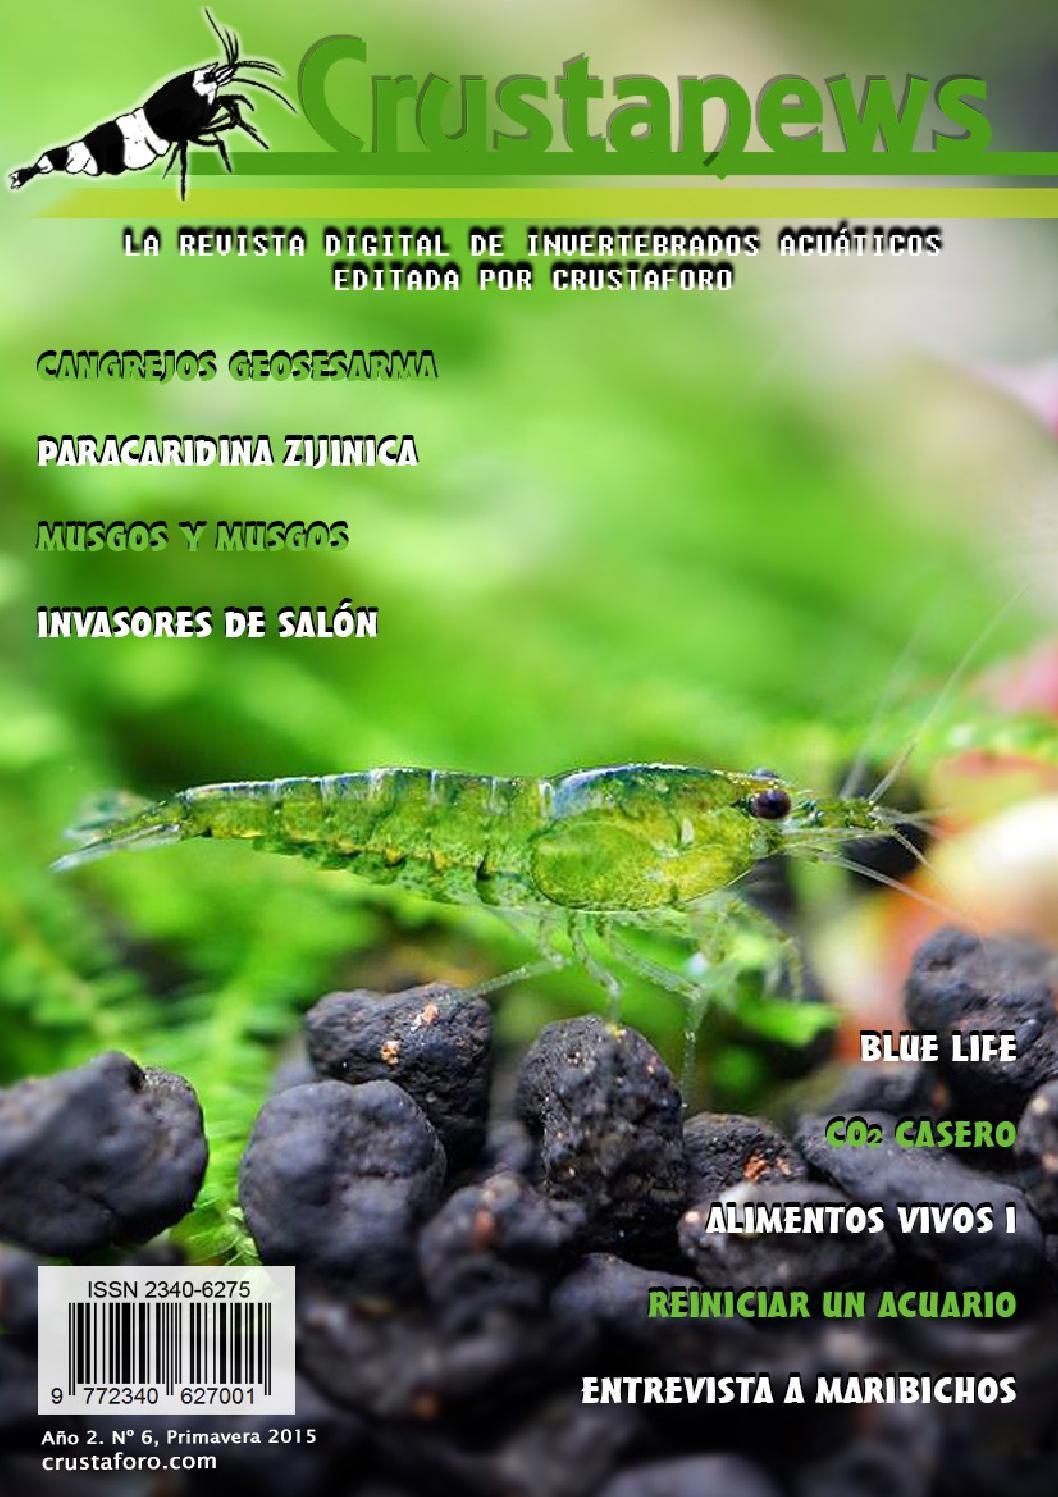 Crustanews Nº6 Primavera 2015